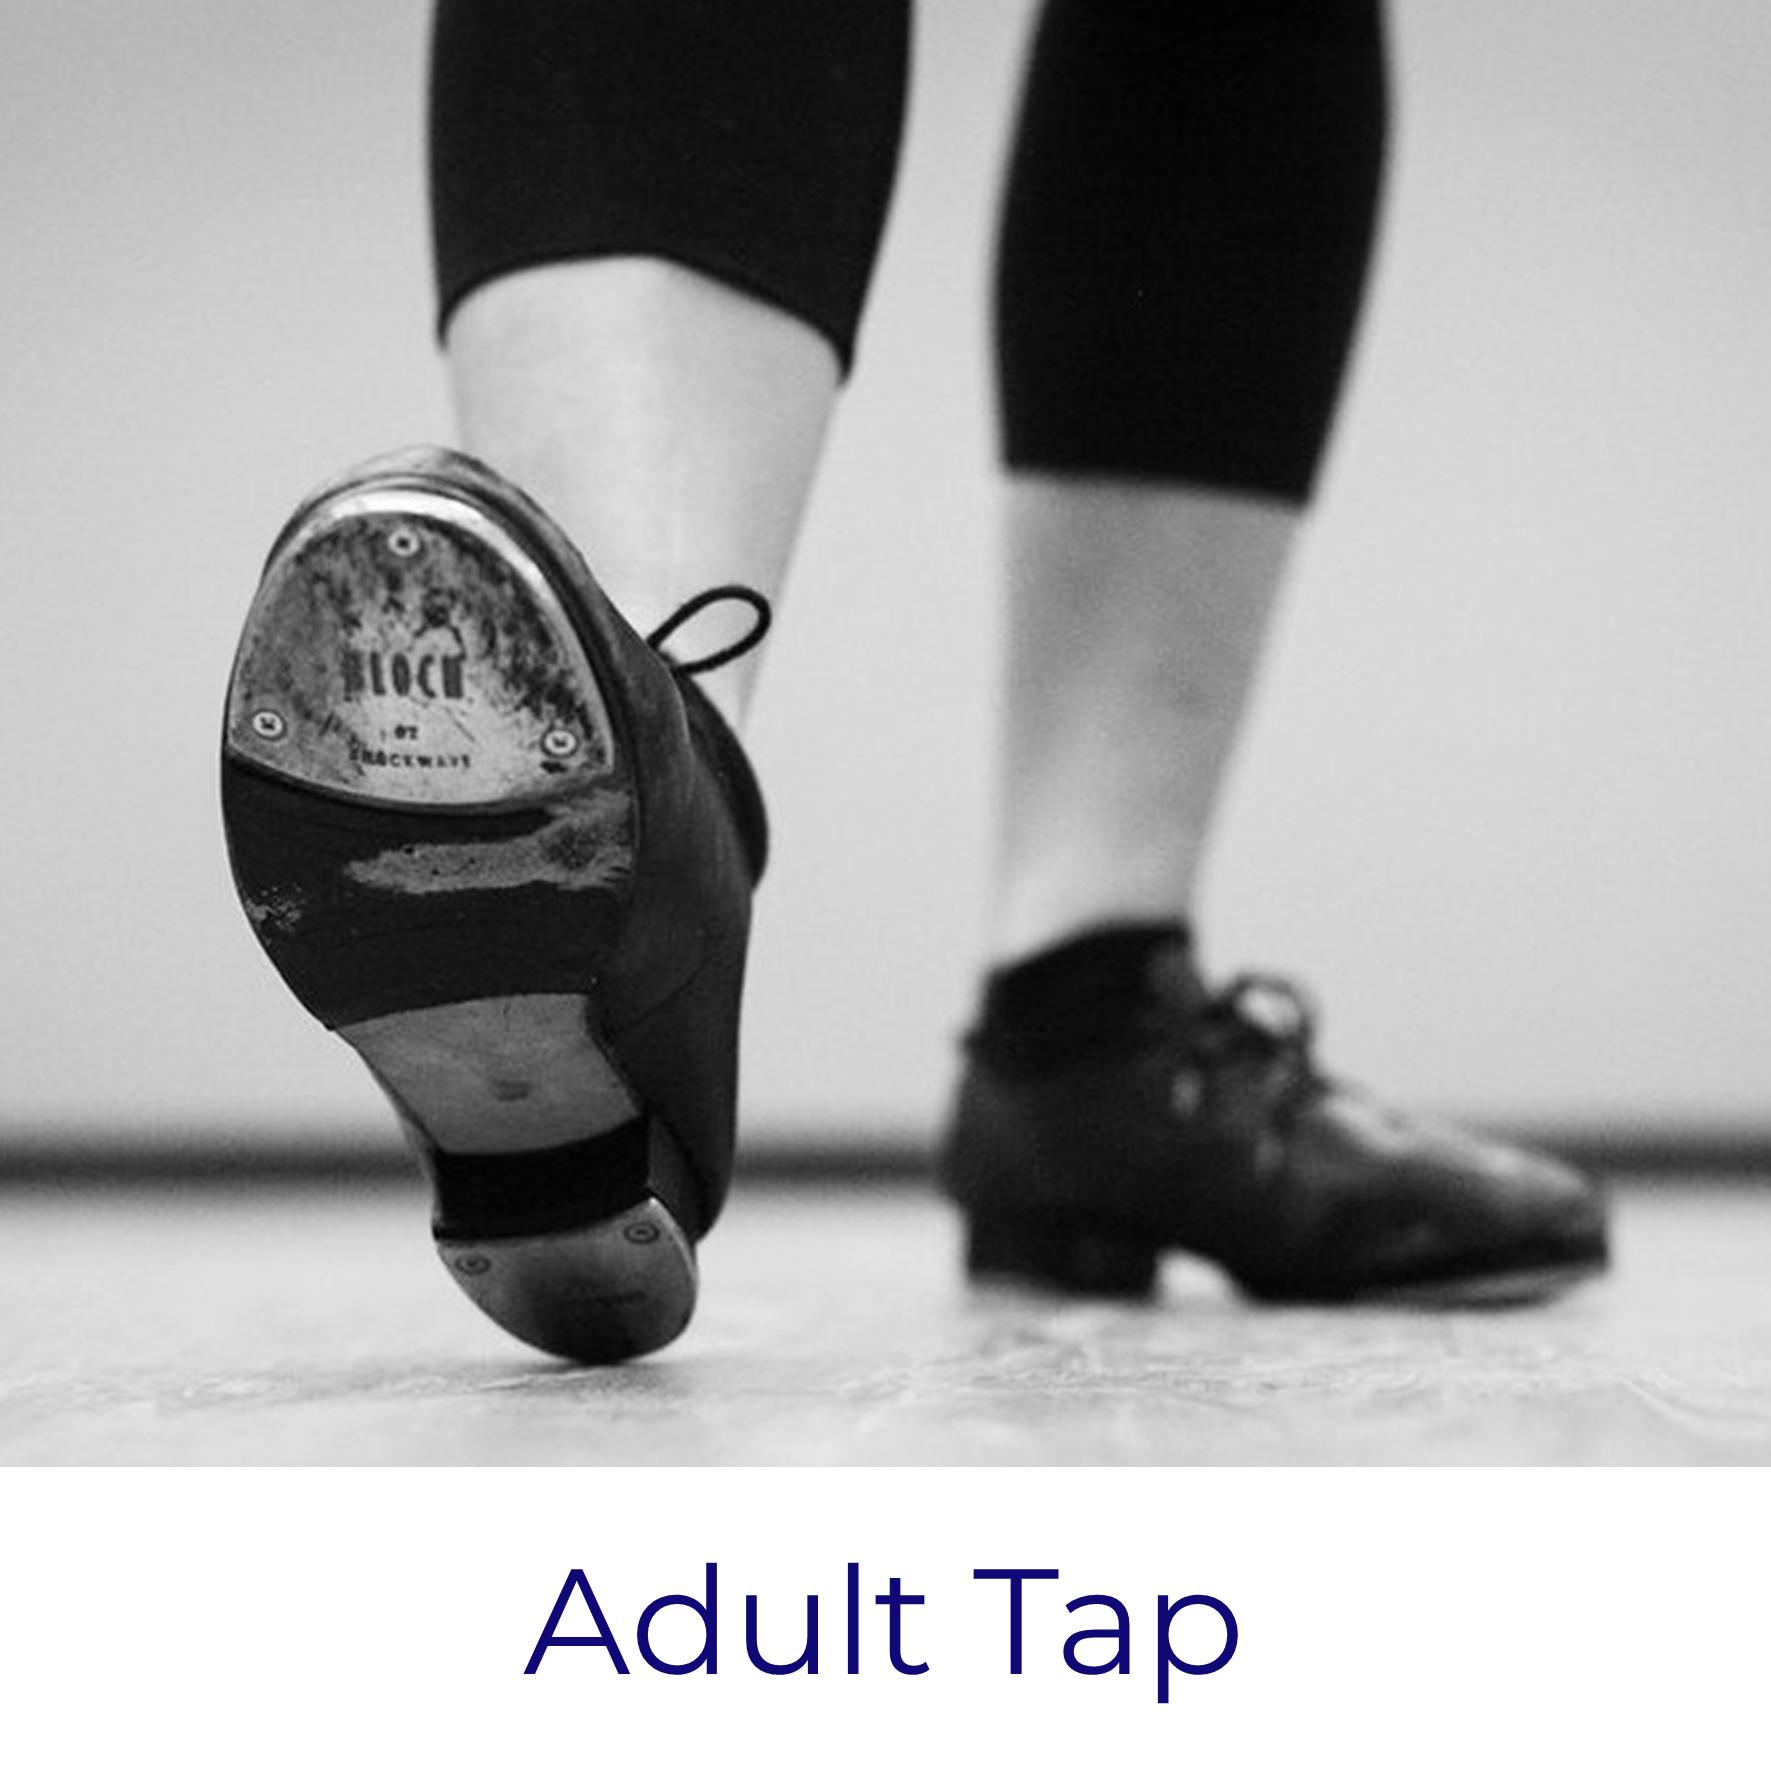 Adult Tap